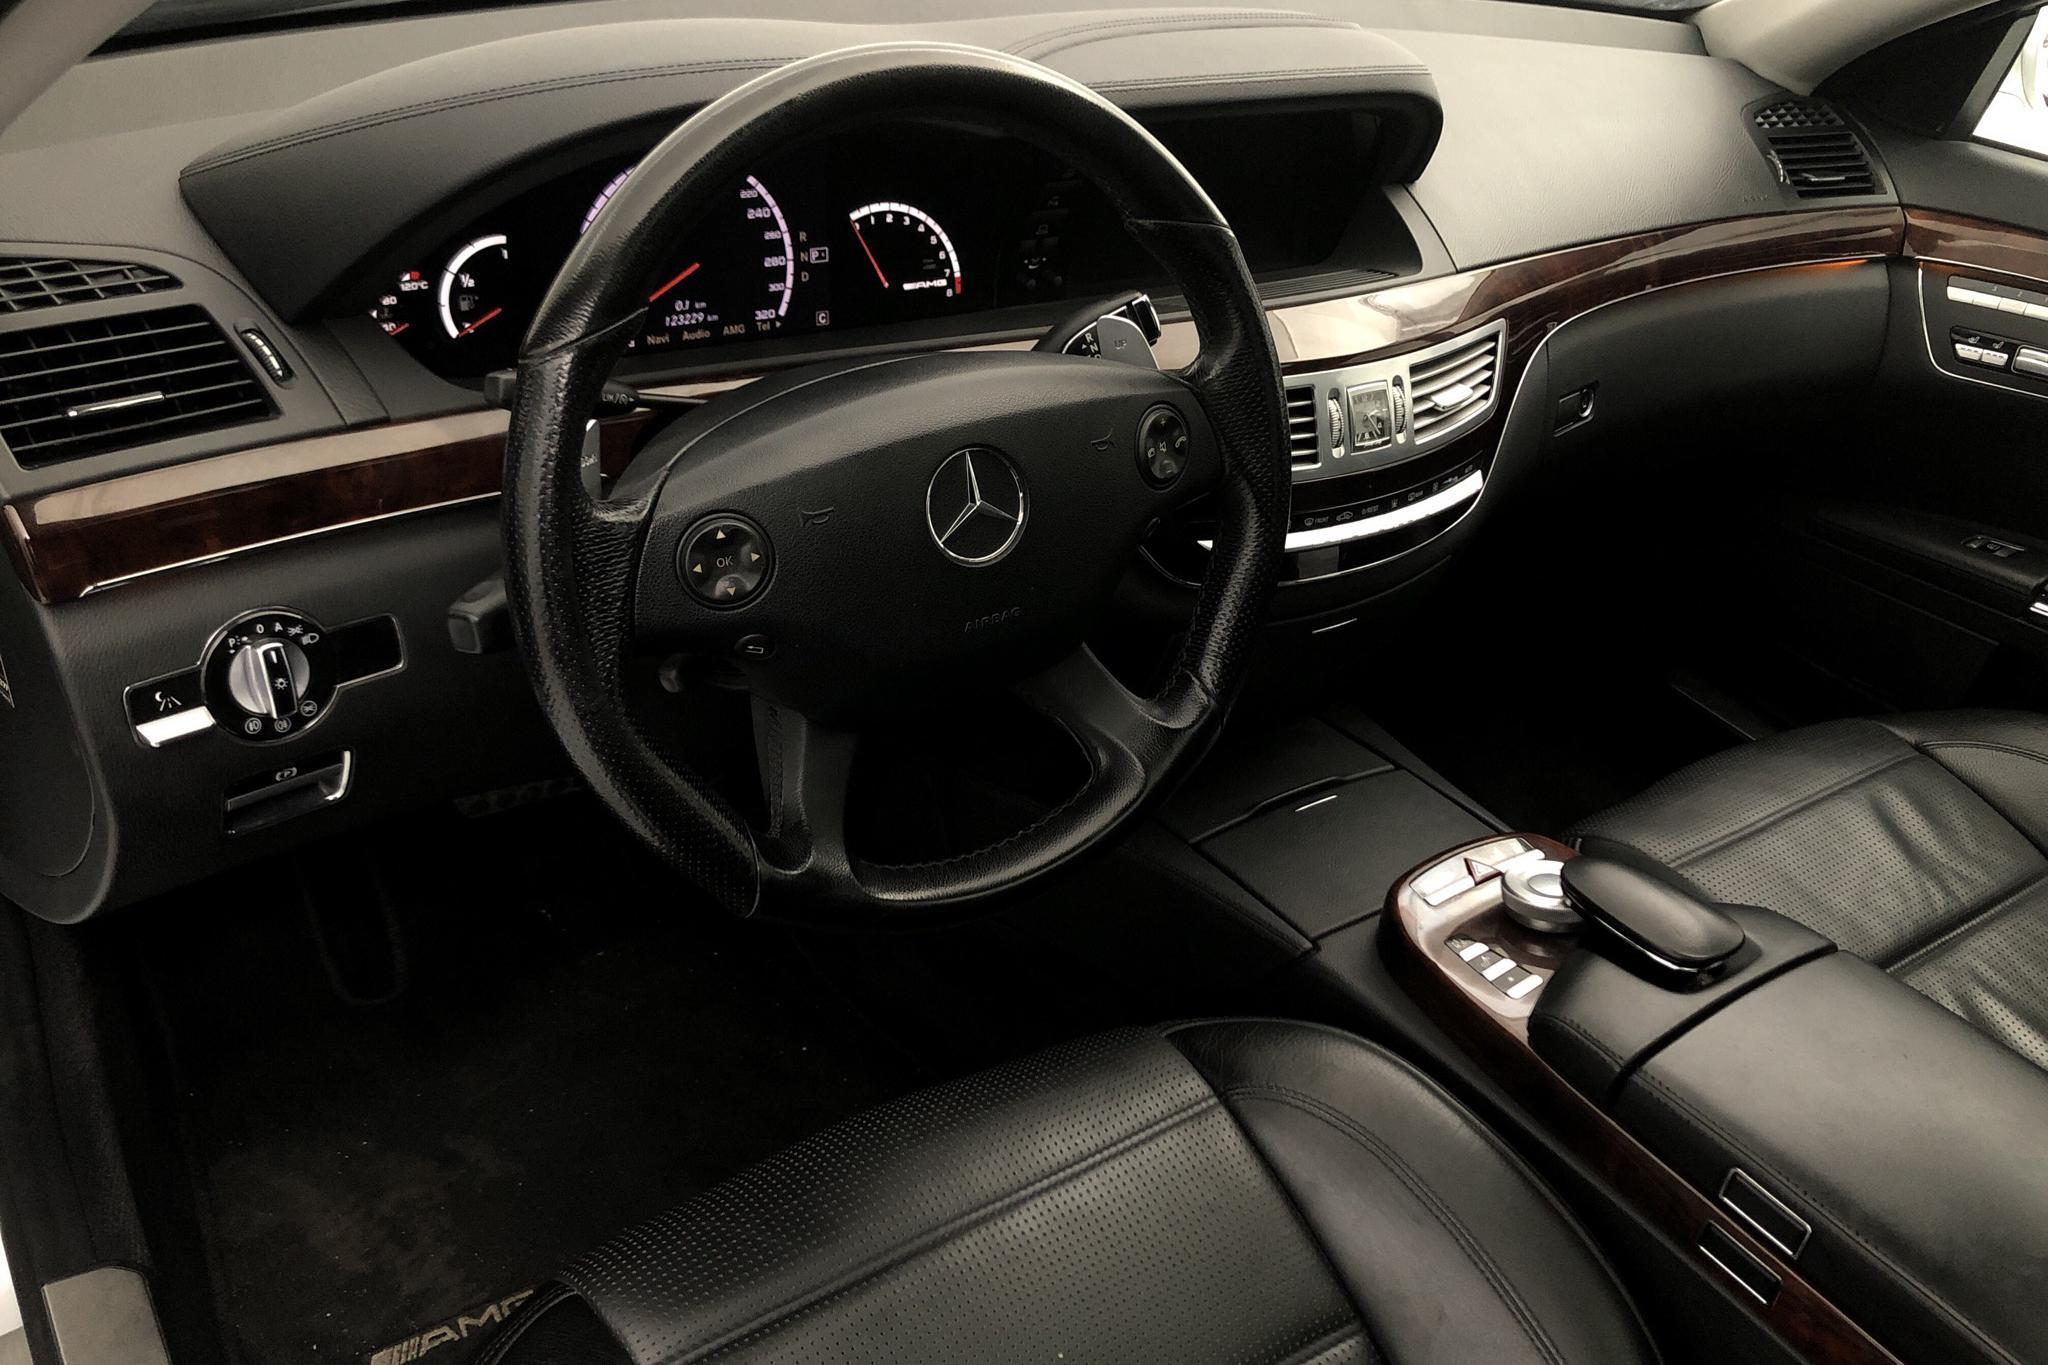 Mercedes S 63 AMG W221 (525hk) - 12 322 mil - Automat - silver - 2008